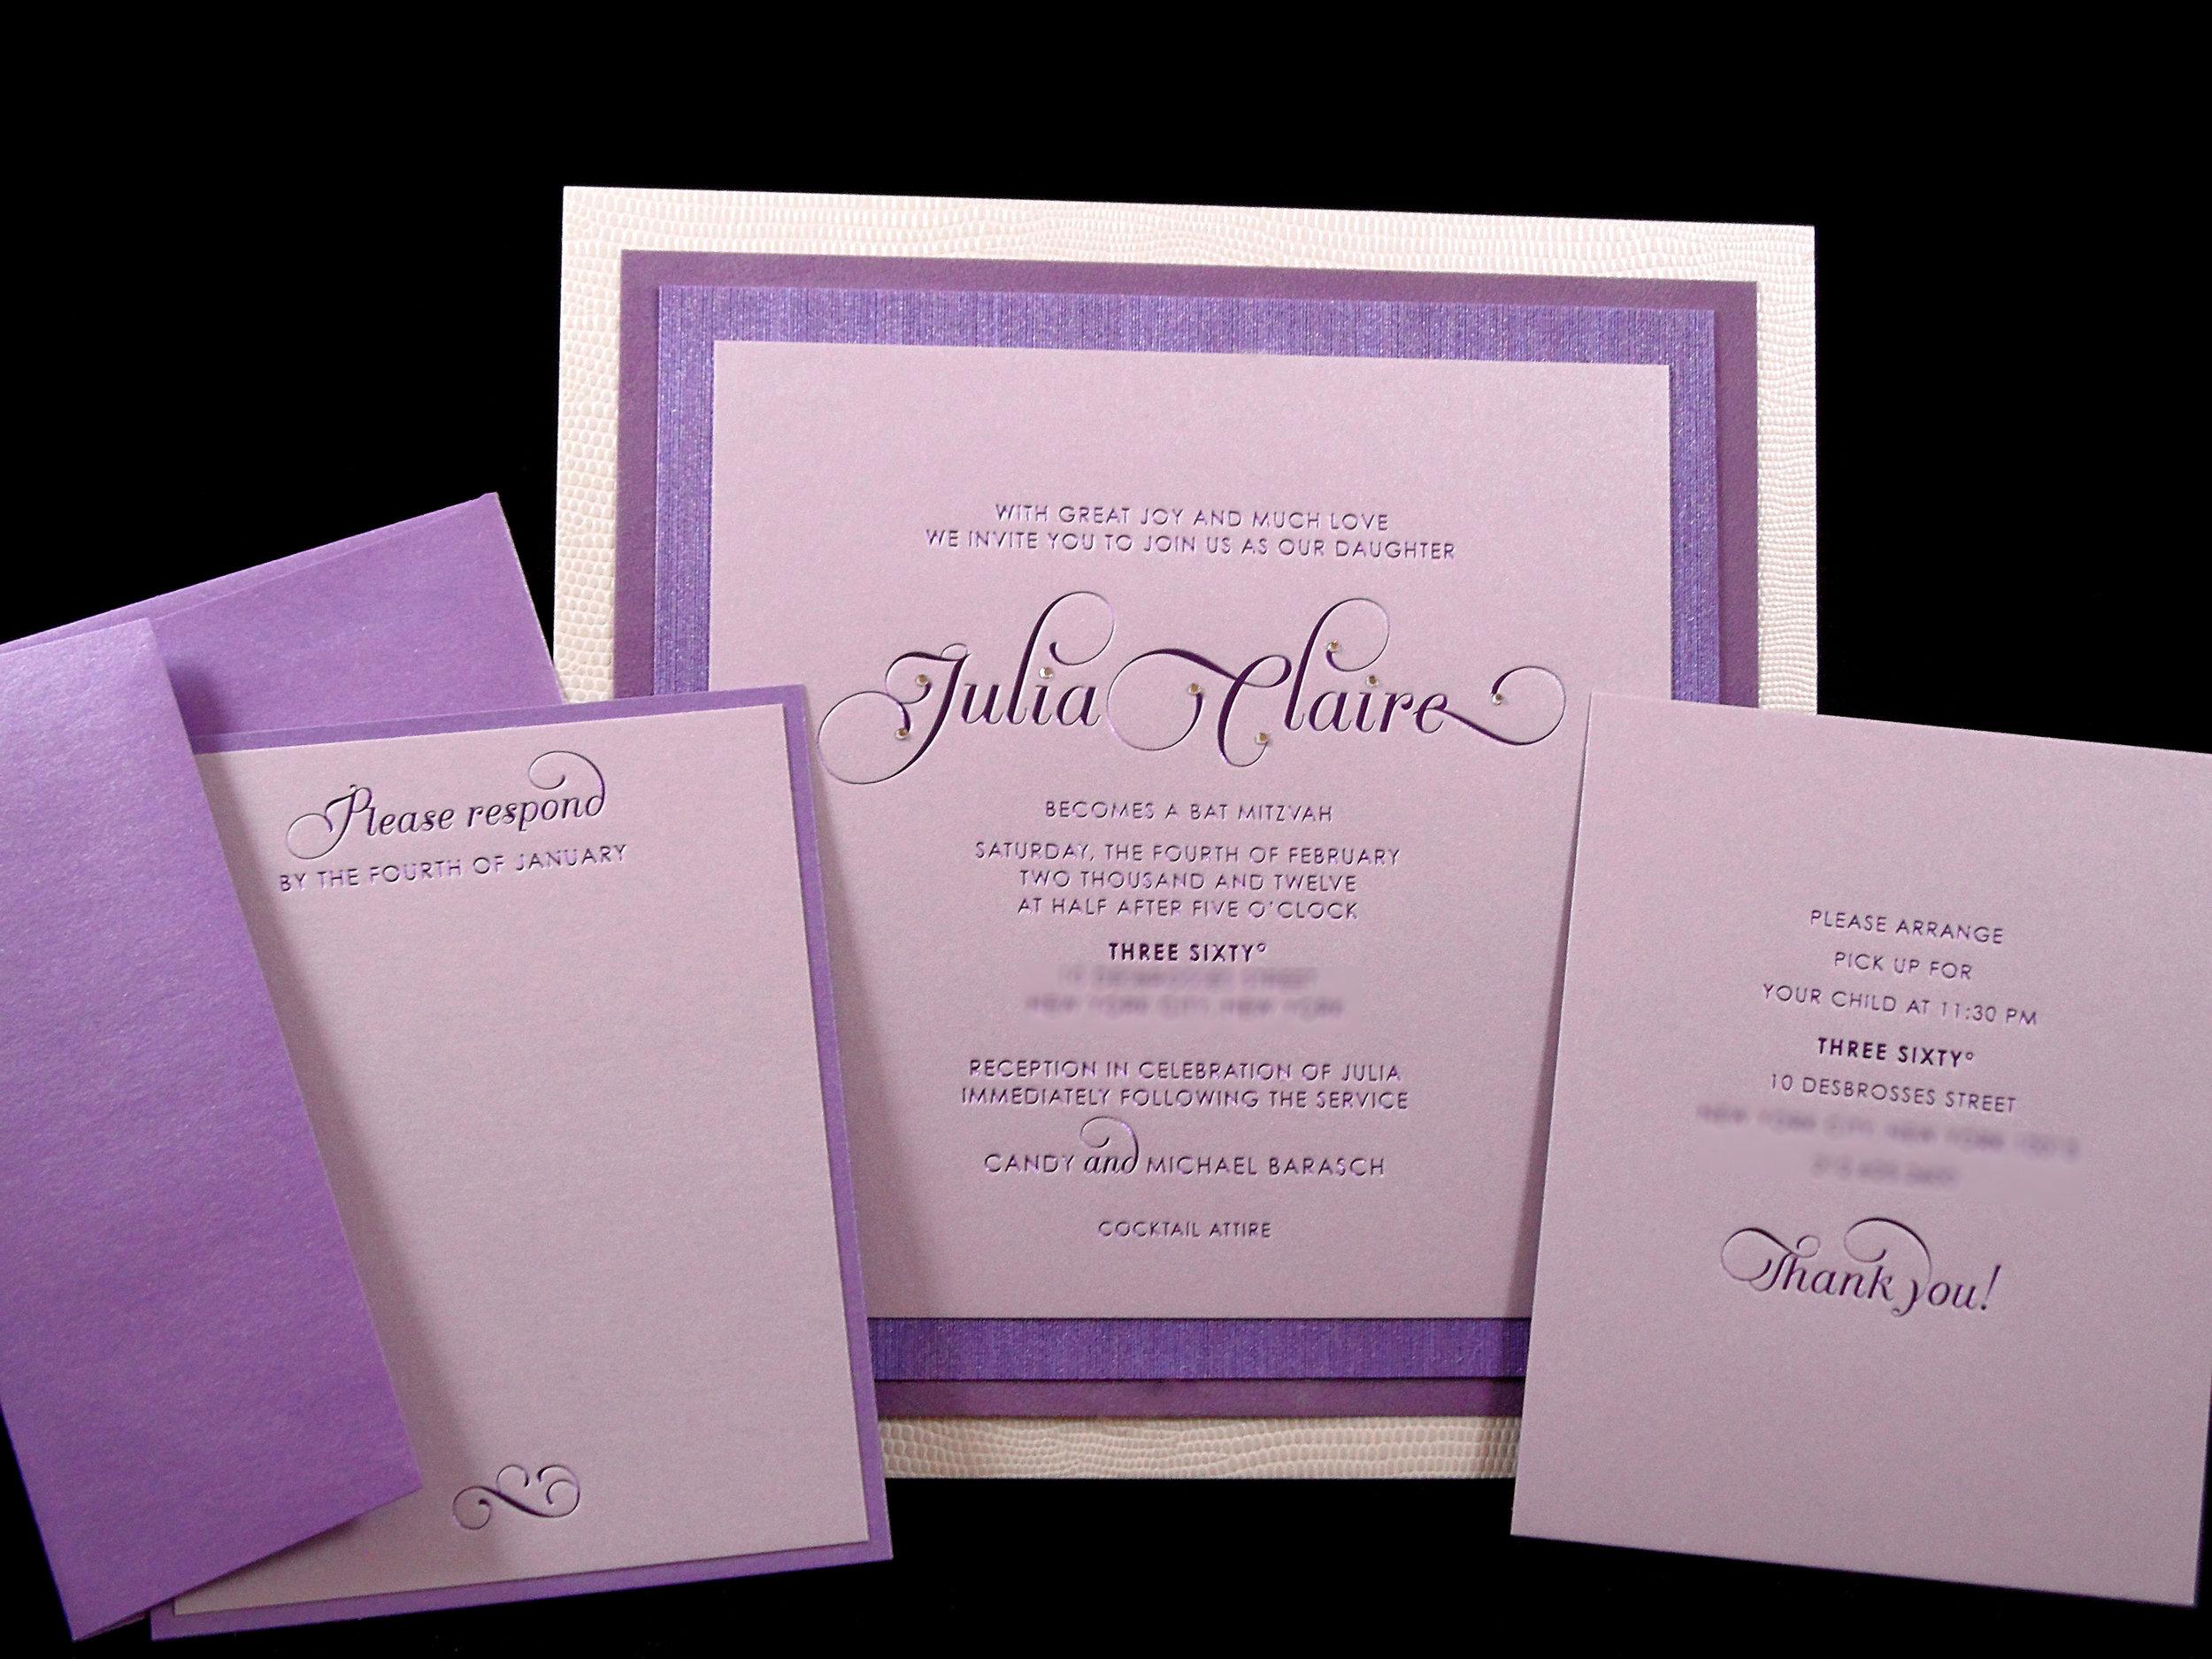 Julias invite.jpg